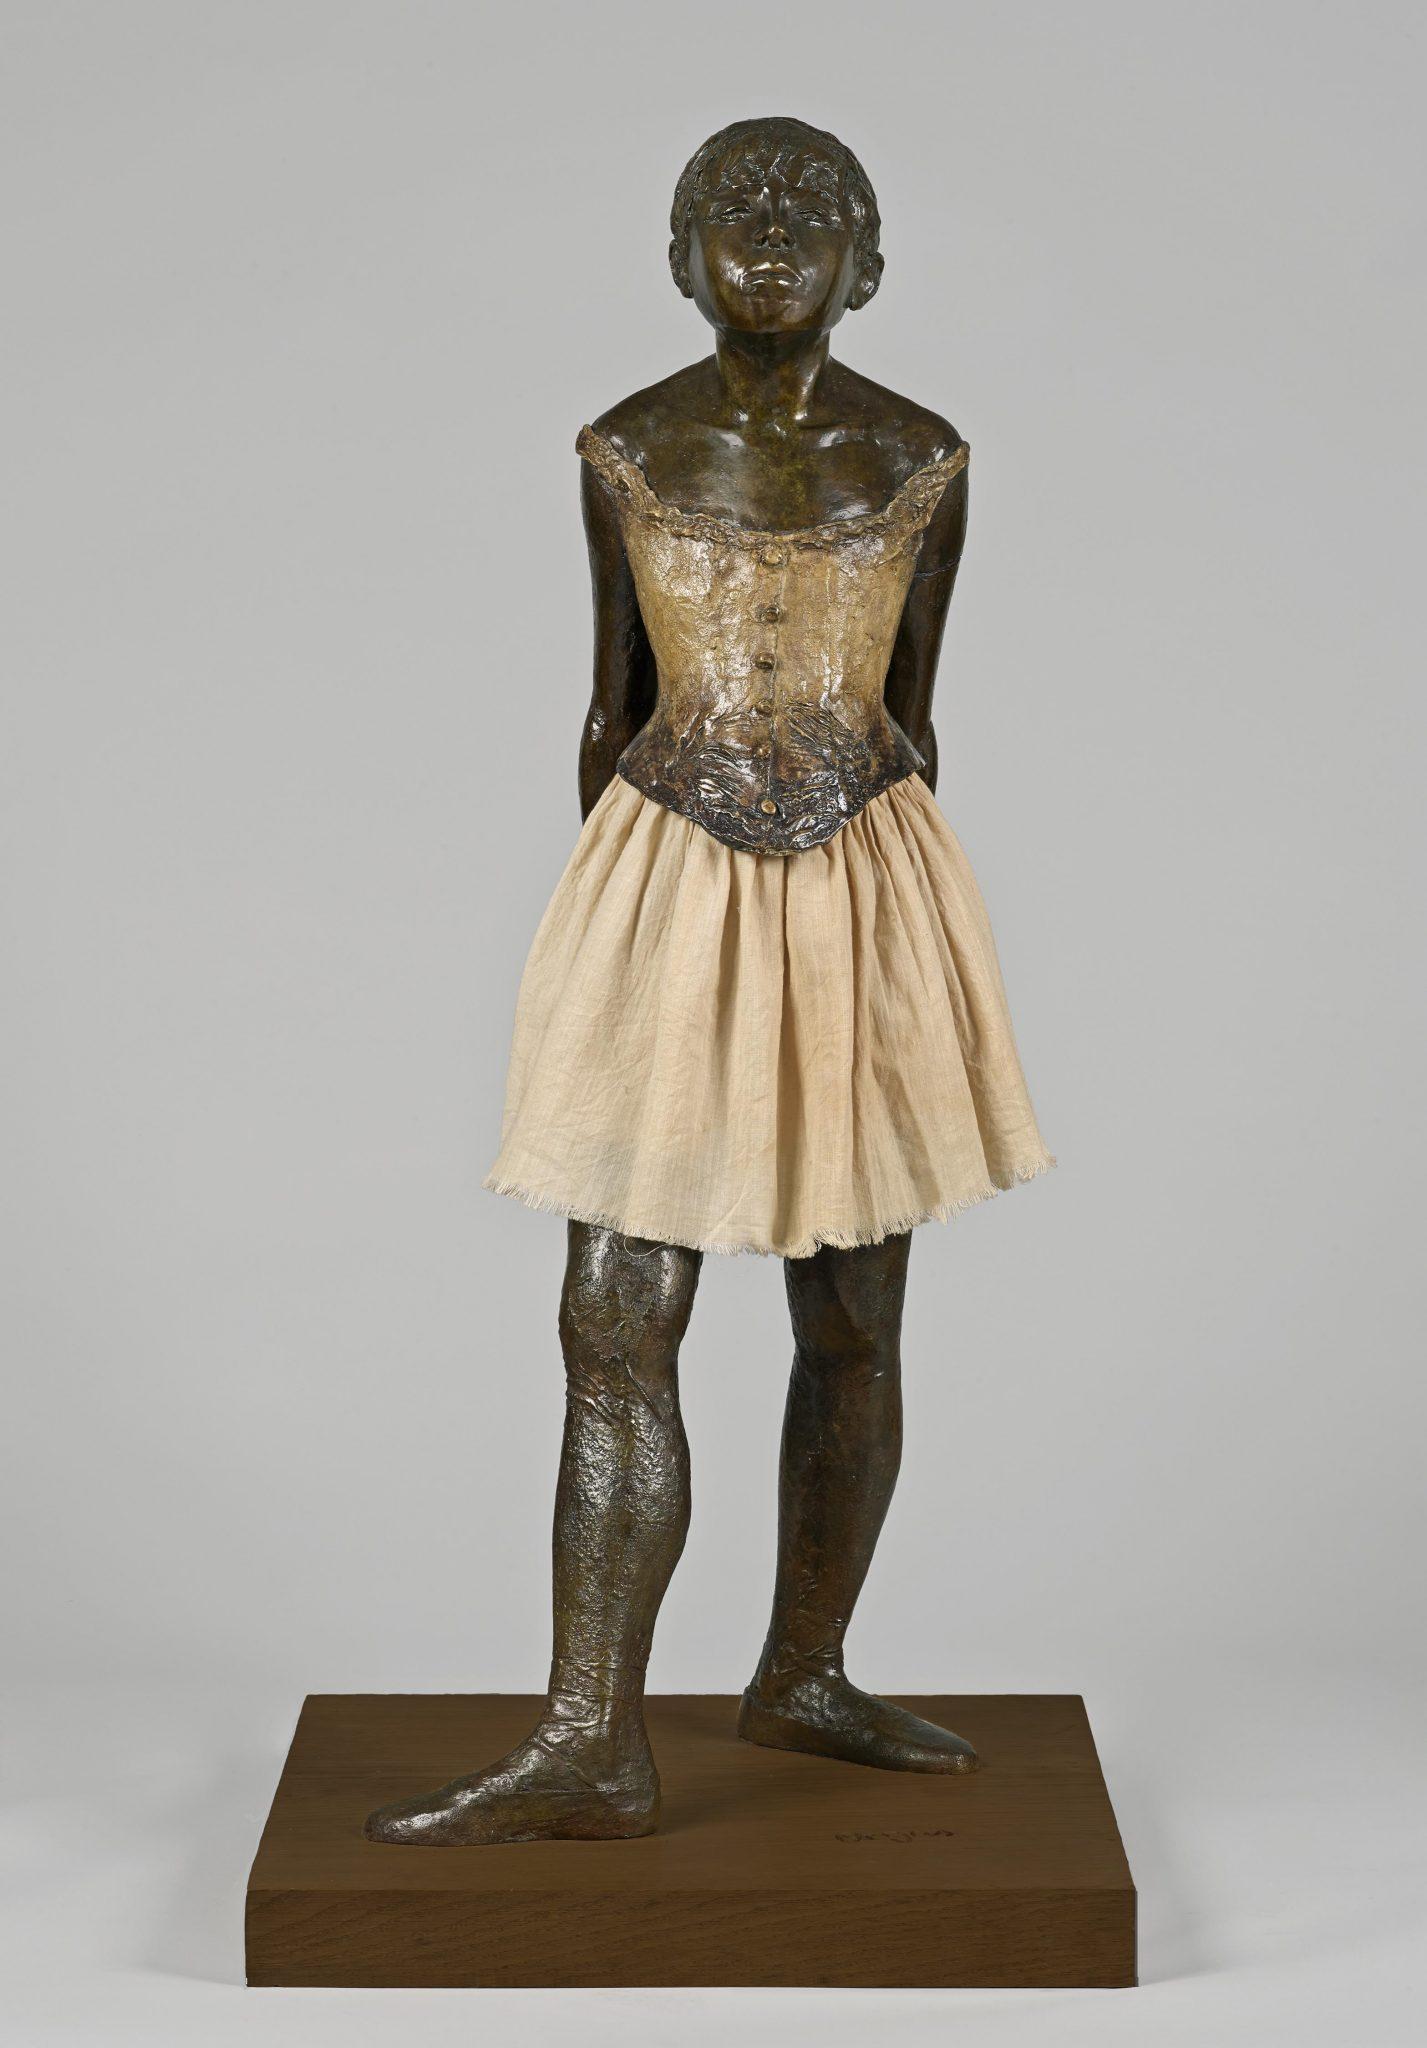 Degas, Edgar ~ Petite Danseuse de Quatorze Ans (Little Dancer, Aged Fourteen)